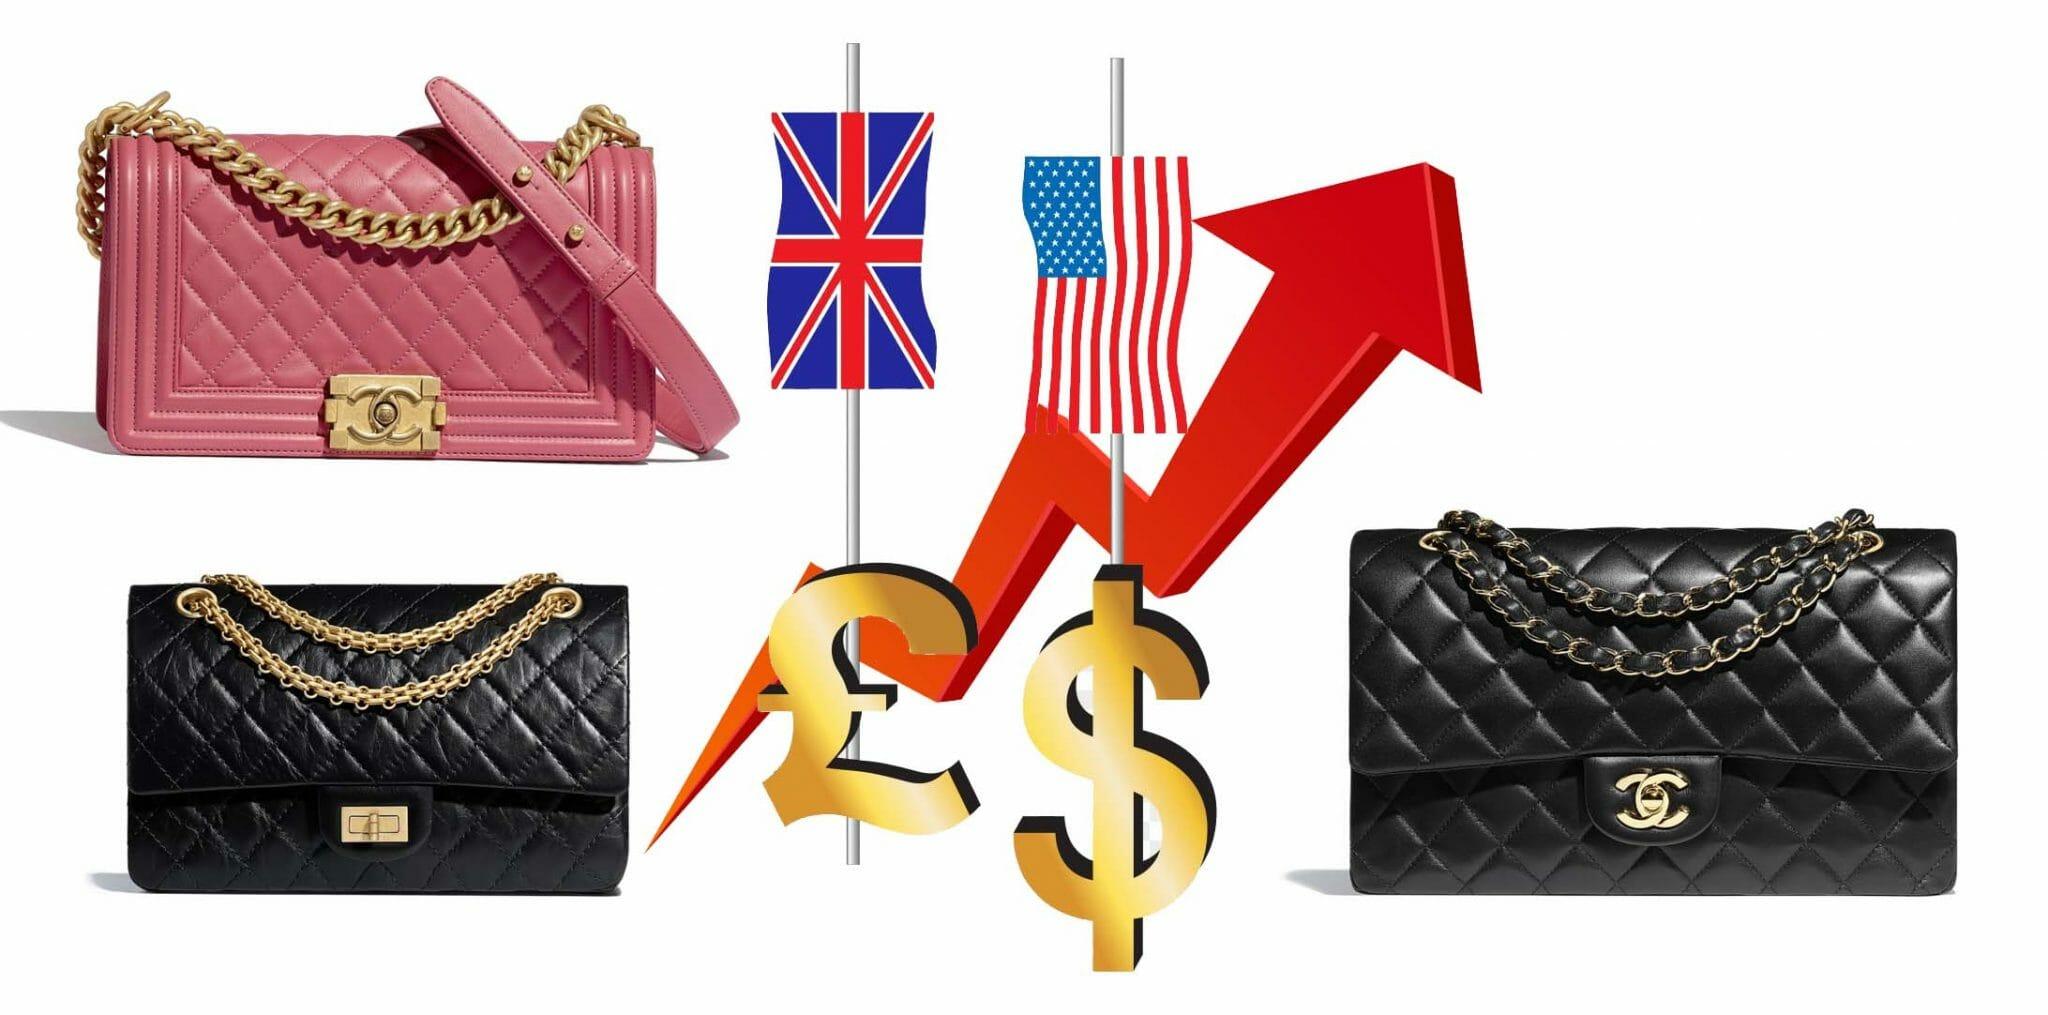 Chanel Bag Price Increase 2020 UK and US